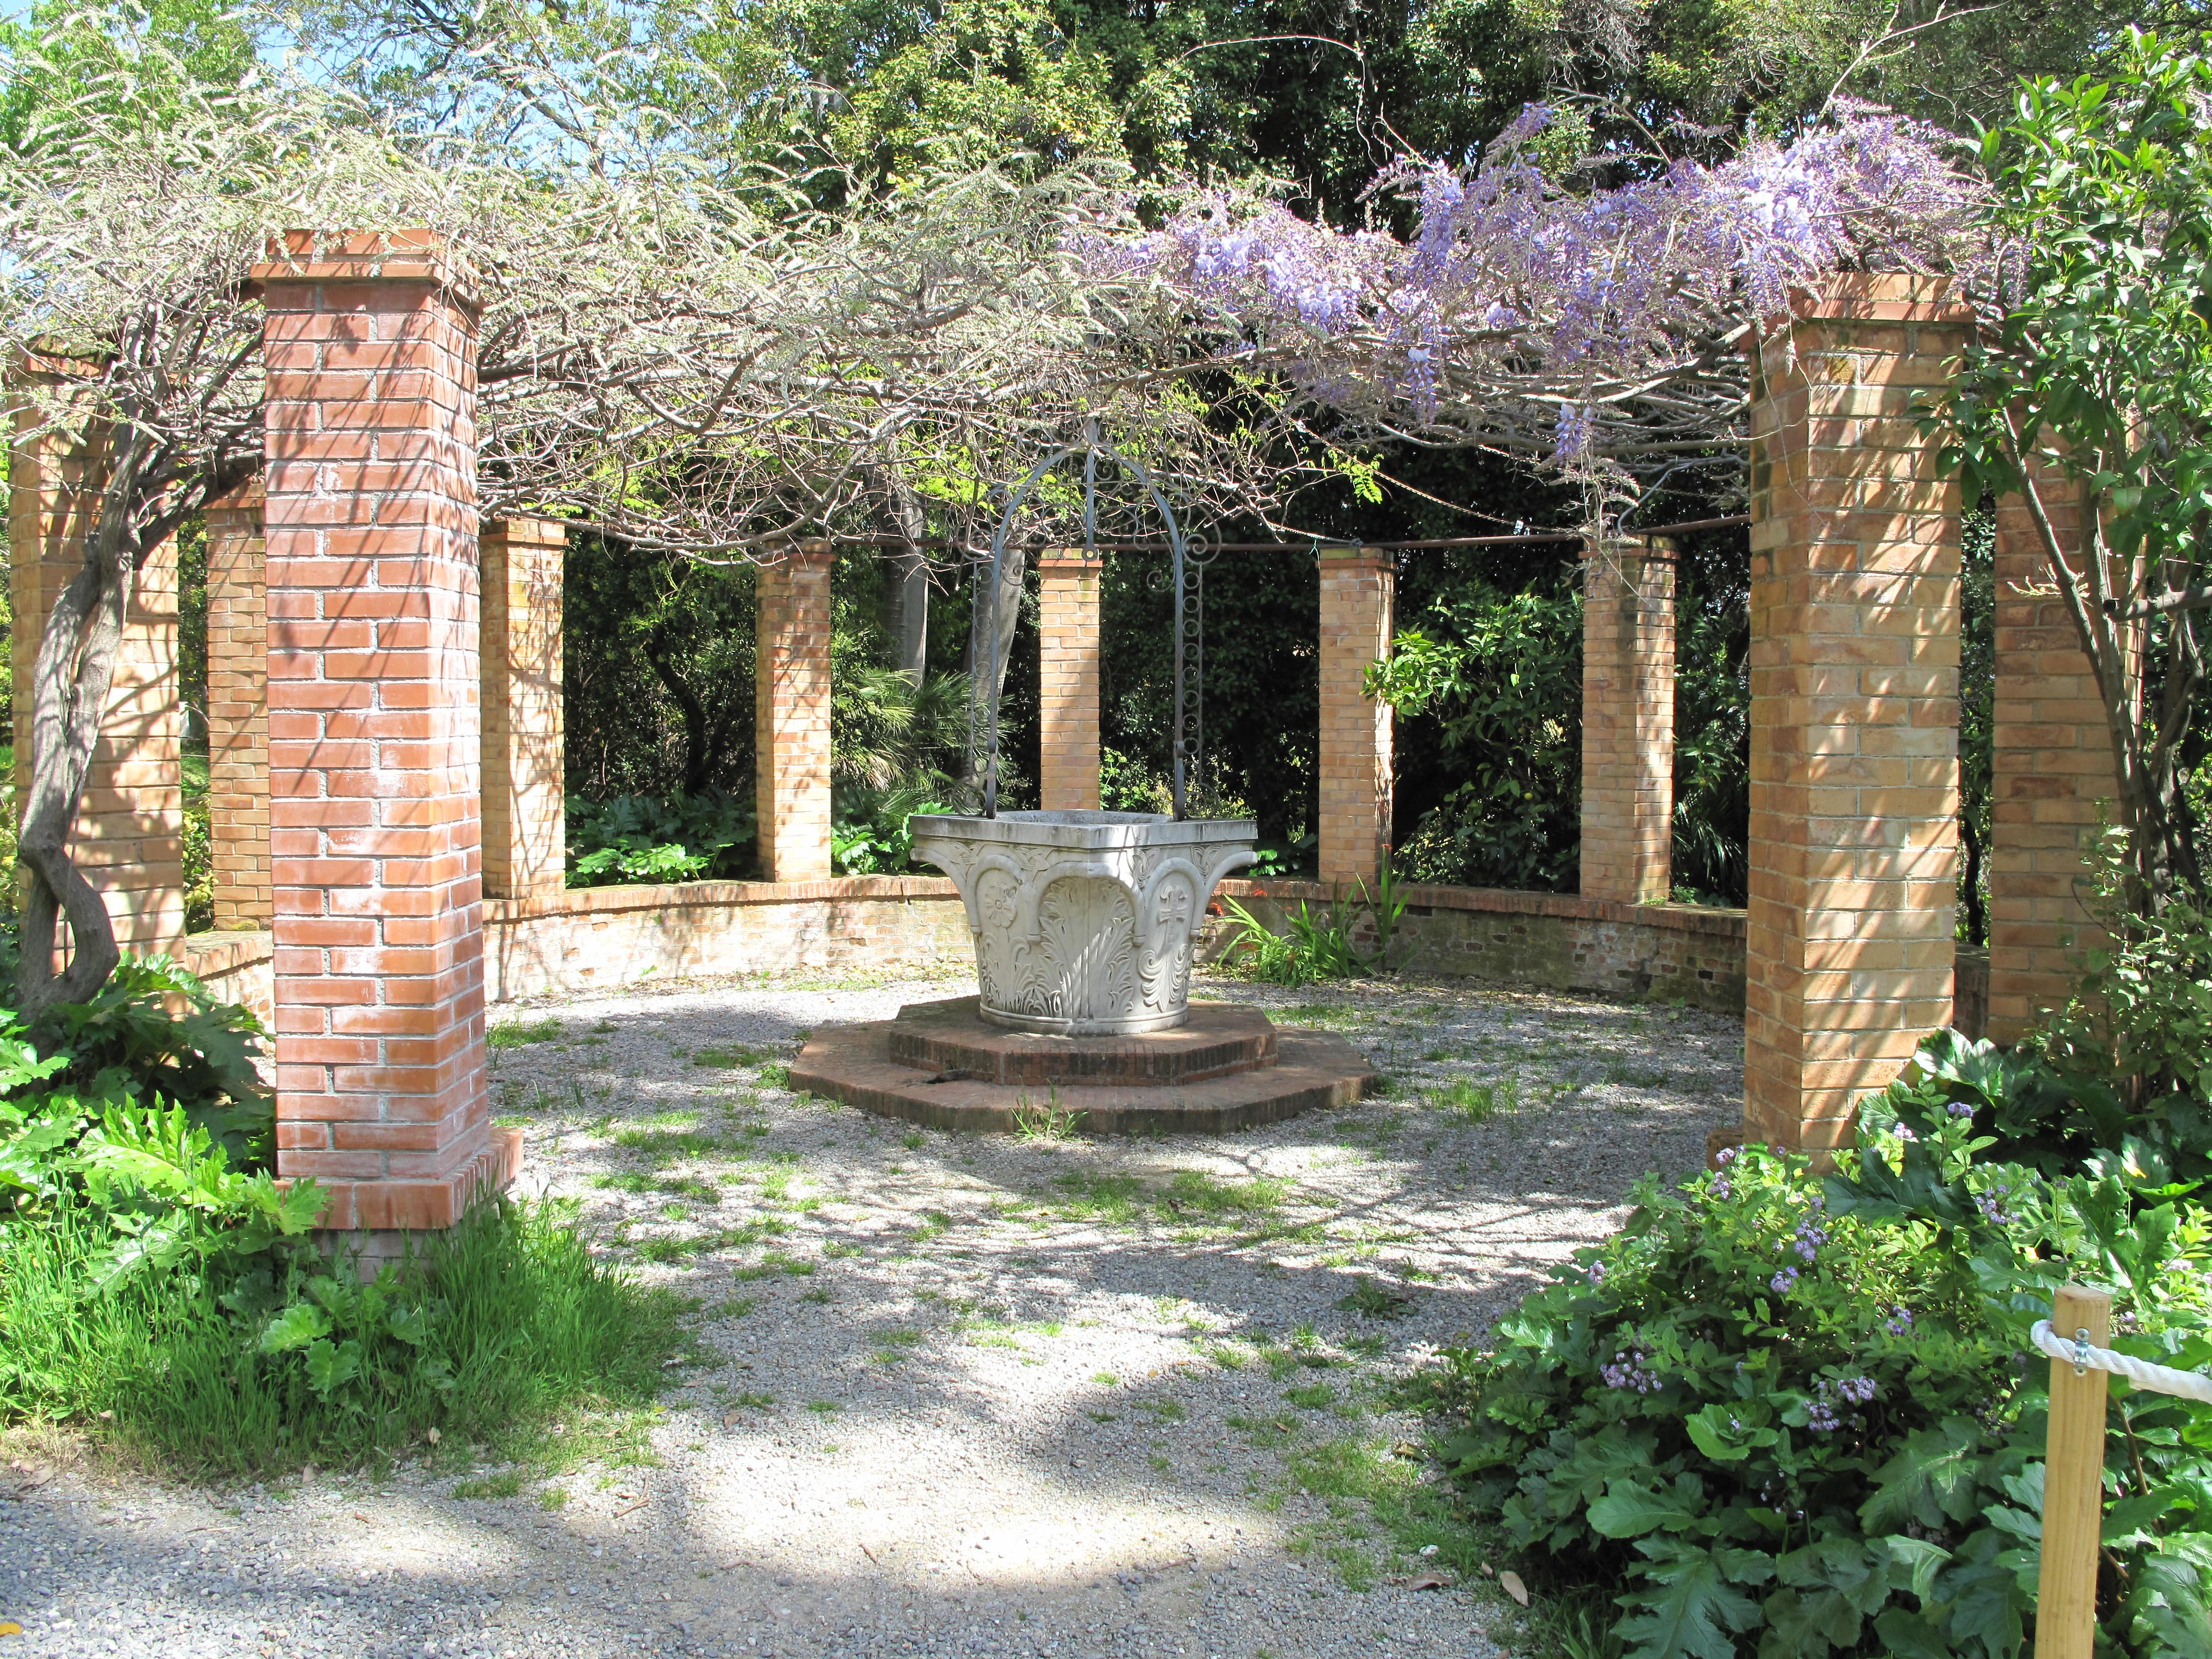 File:Pergola in the Hanbury gardens.jpg - Wikimedia Commons